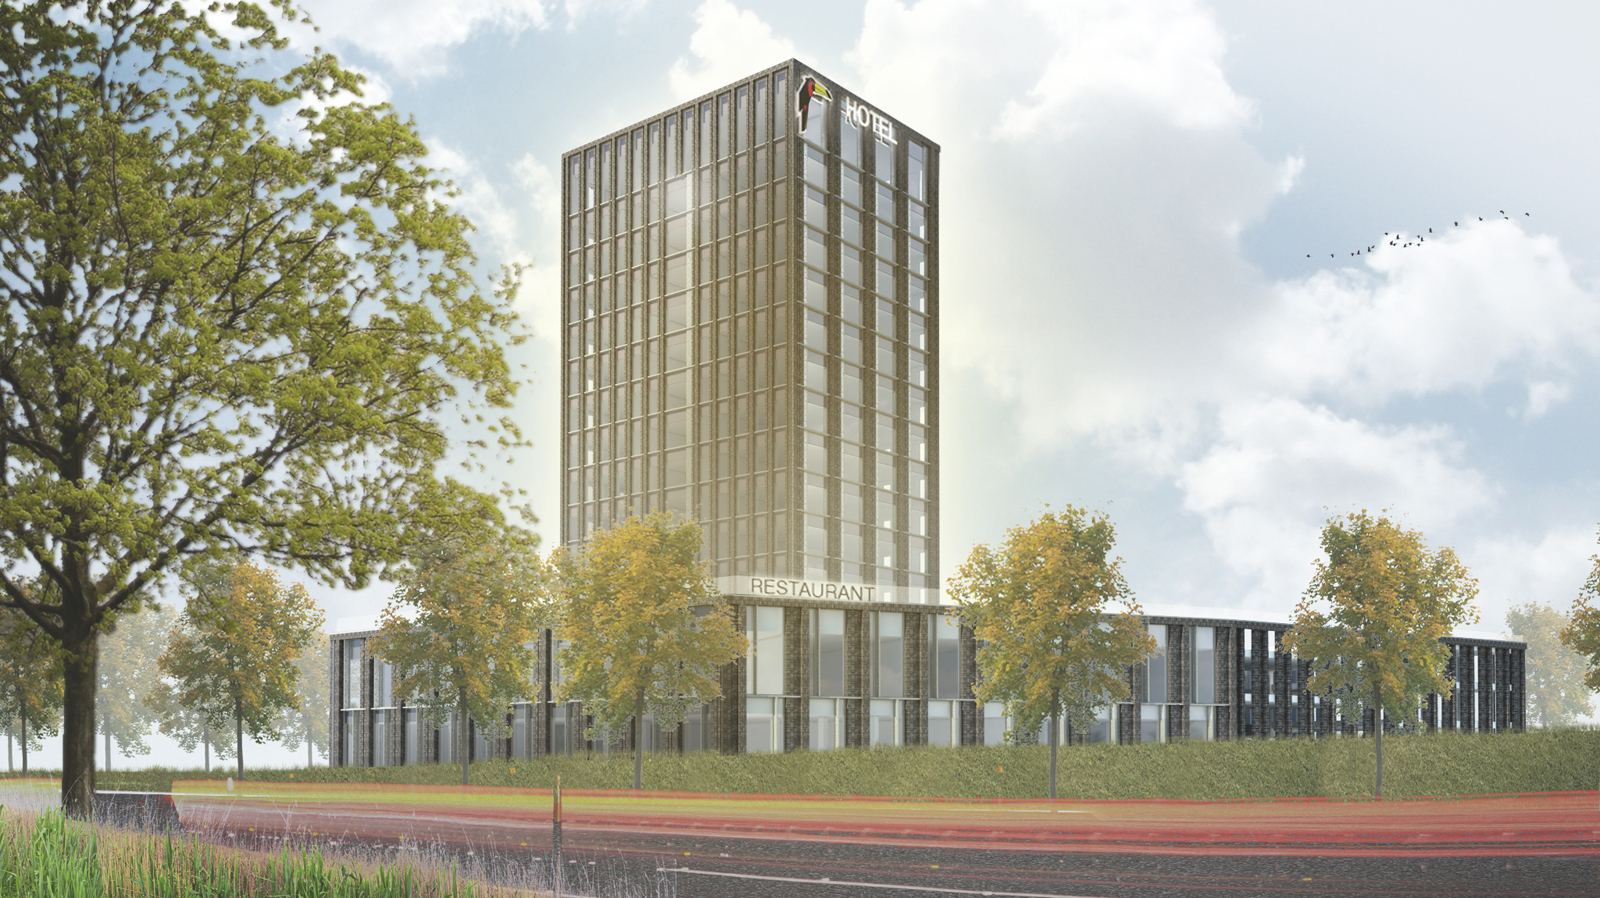 Wiegerinck _ Hotel van der Valk - Nijmegen